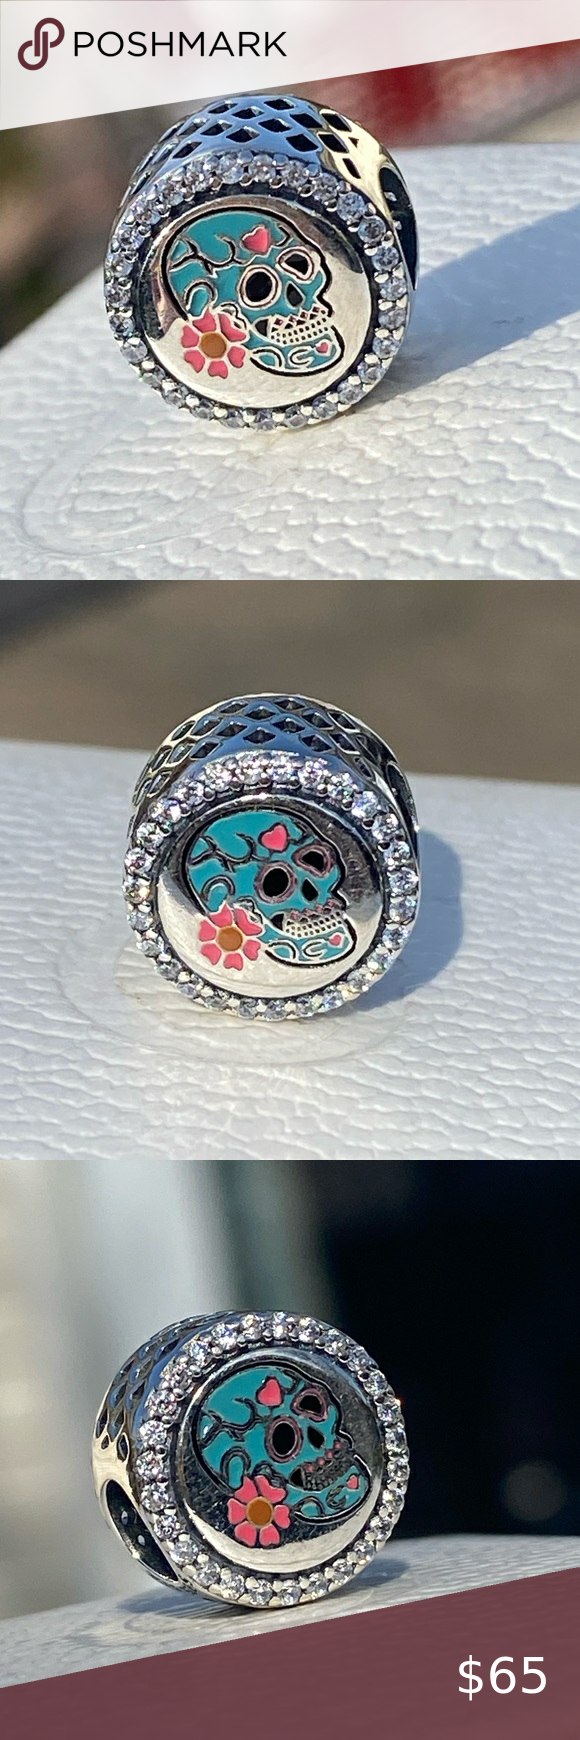 Pandora Day of the Dead (DÍA DE MUERTOS) Charm | Womens jewelry ...